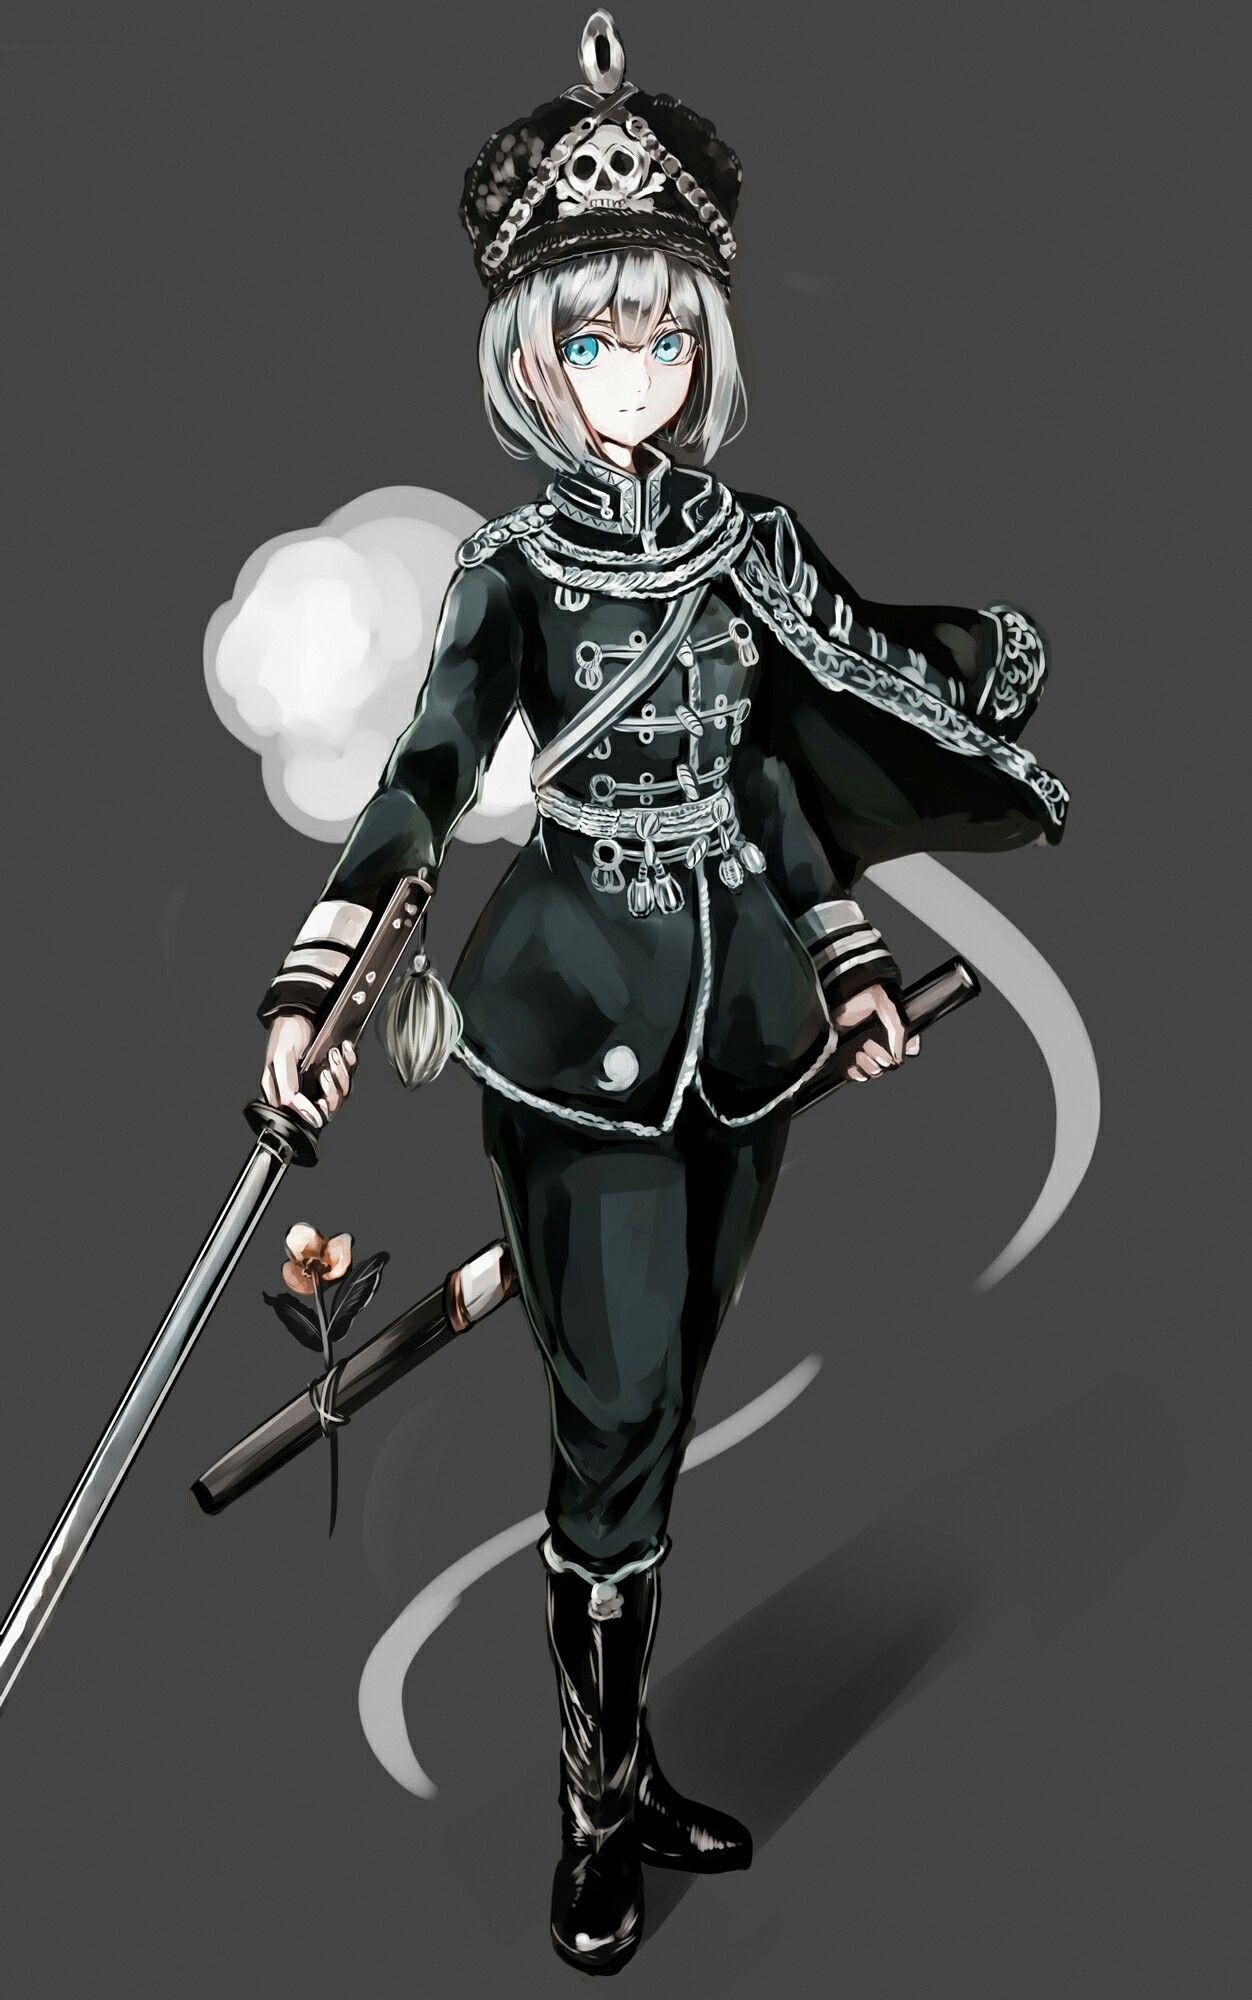 Obey ! 💕 Anime warrior girl, Anime military, Anime warrior